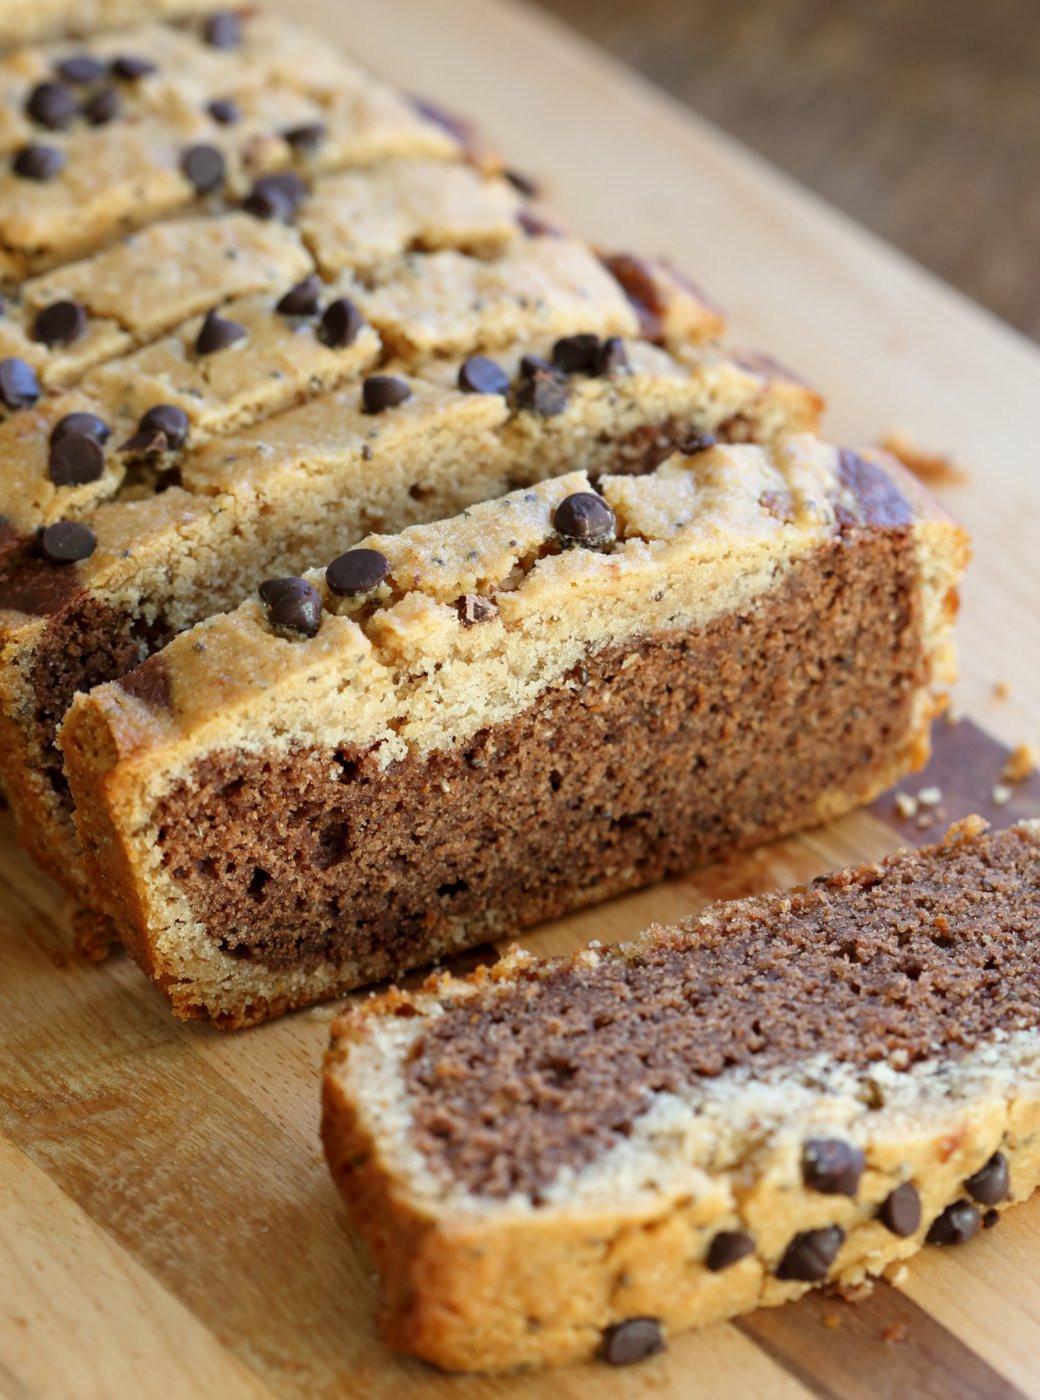 Gluten Free Cake Recipes  Gluten free Cashew or Peanut Butter Chocolate Marble Cake